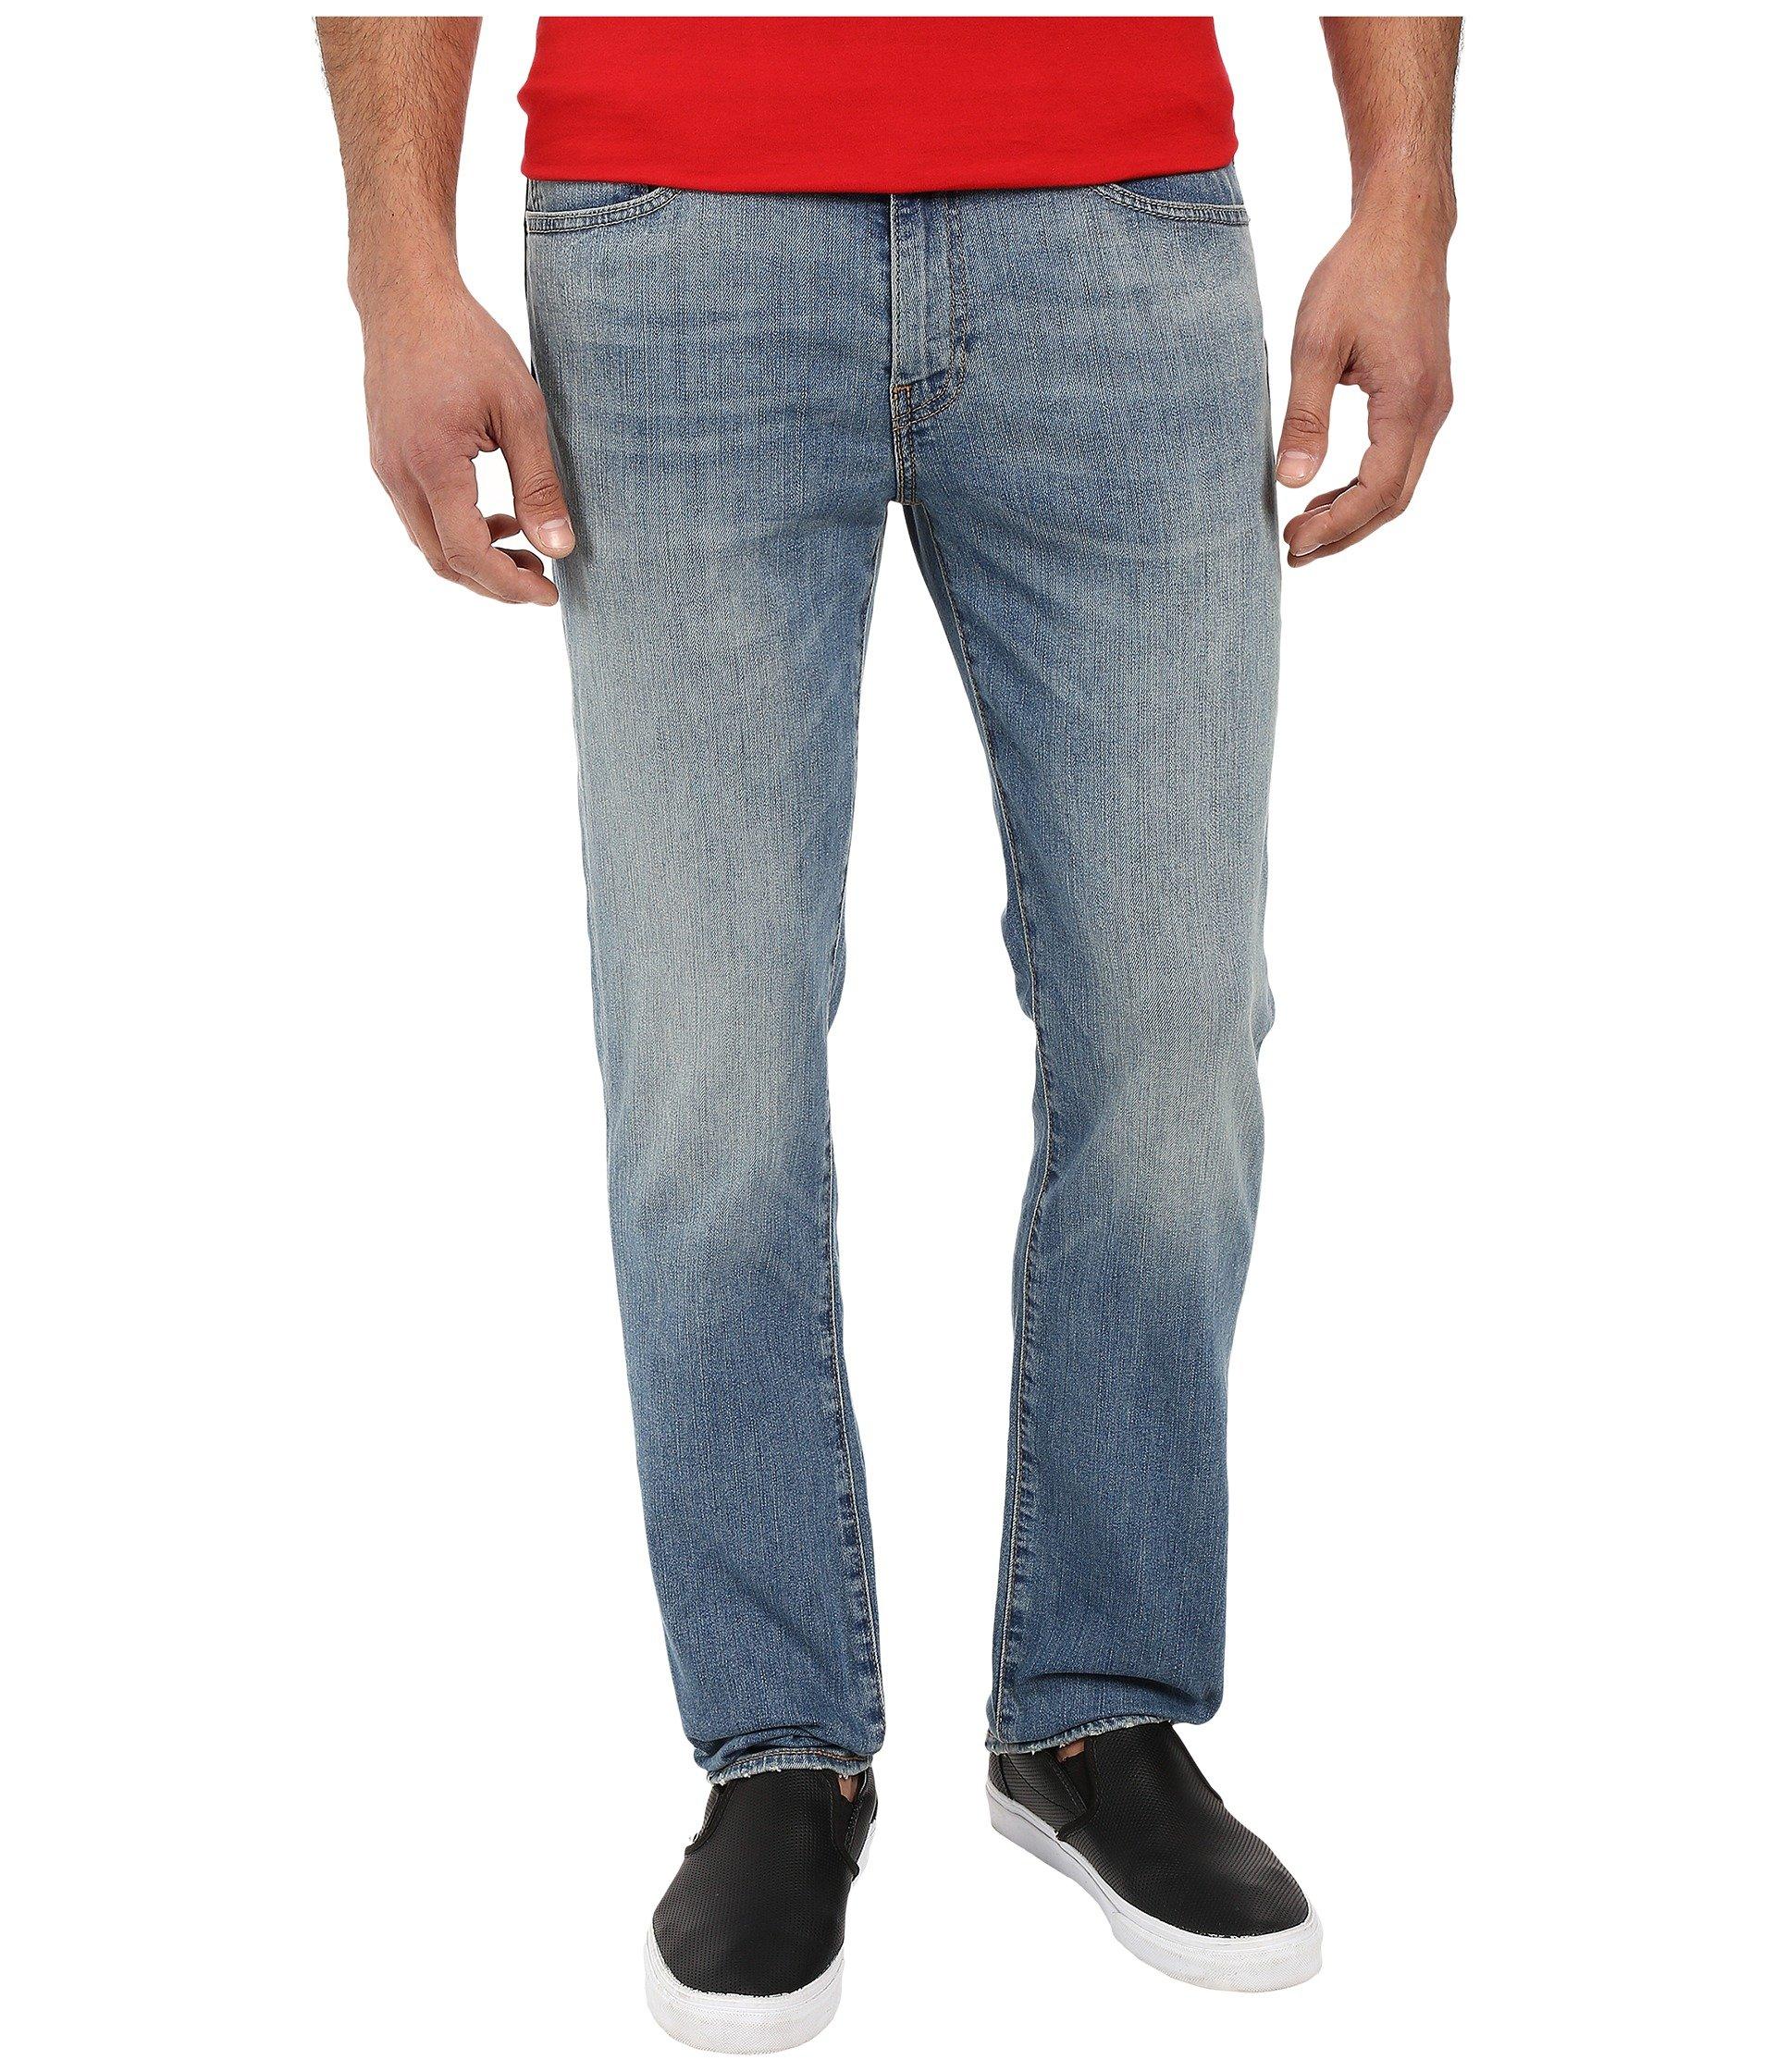 Levi's Men's 511 Slim Fit Advanced Stretch Jeans,Sun Fade,32W x 29L